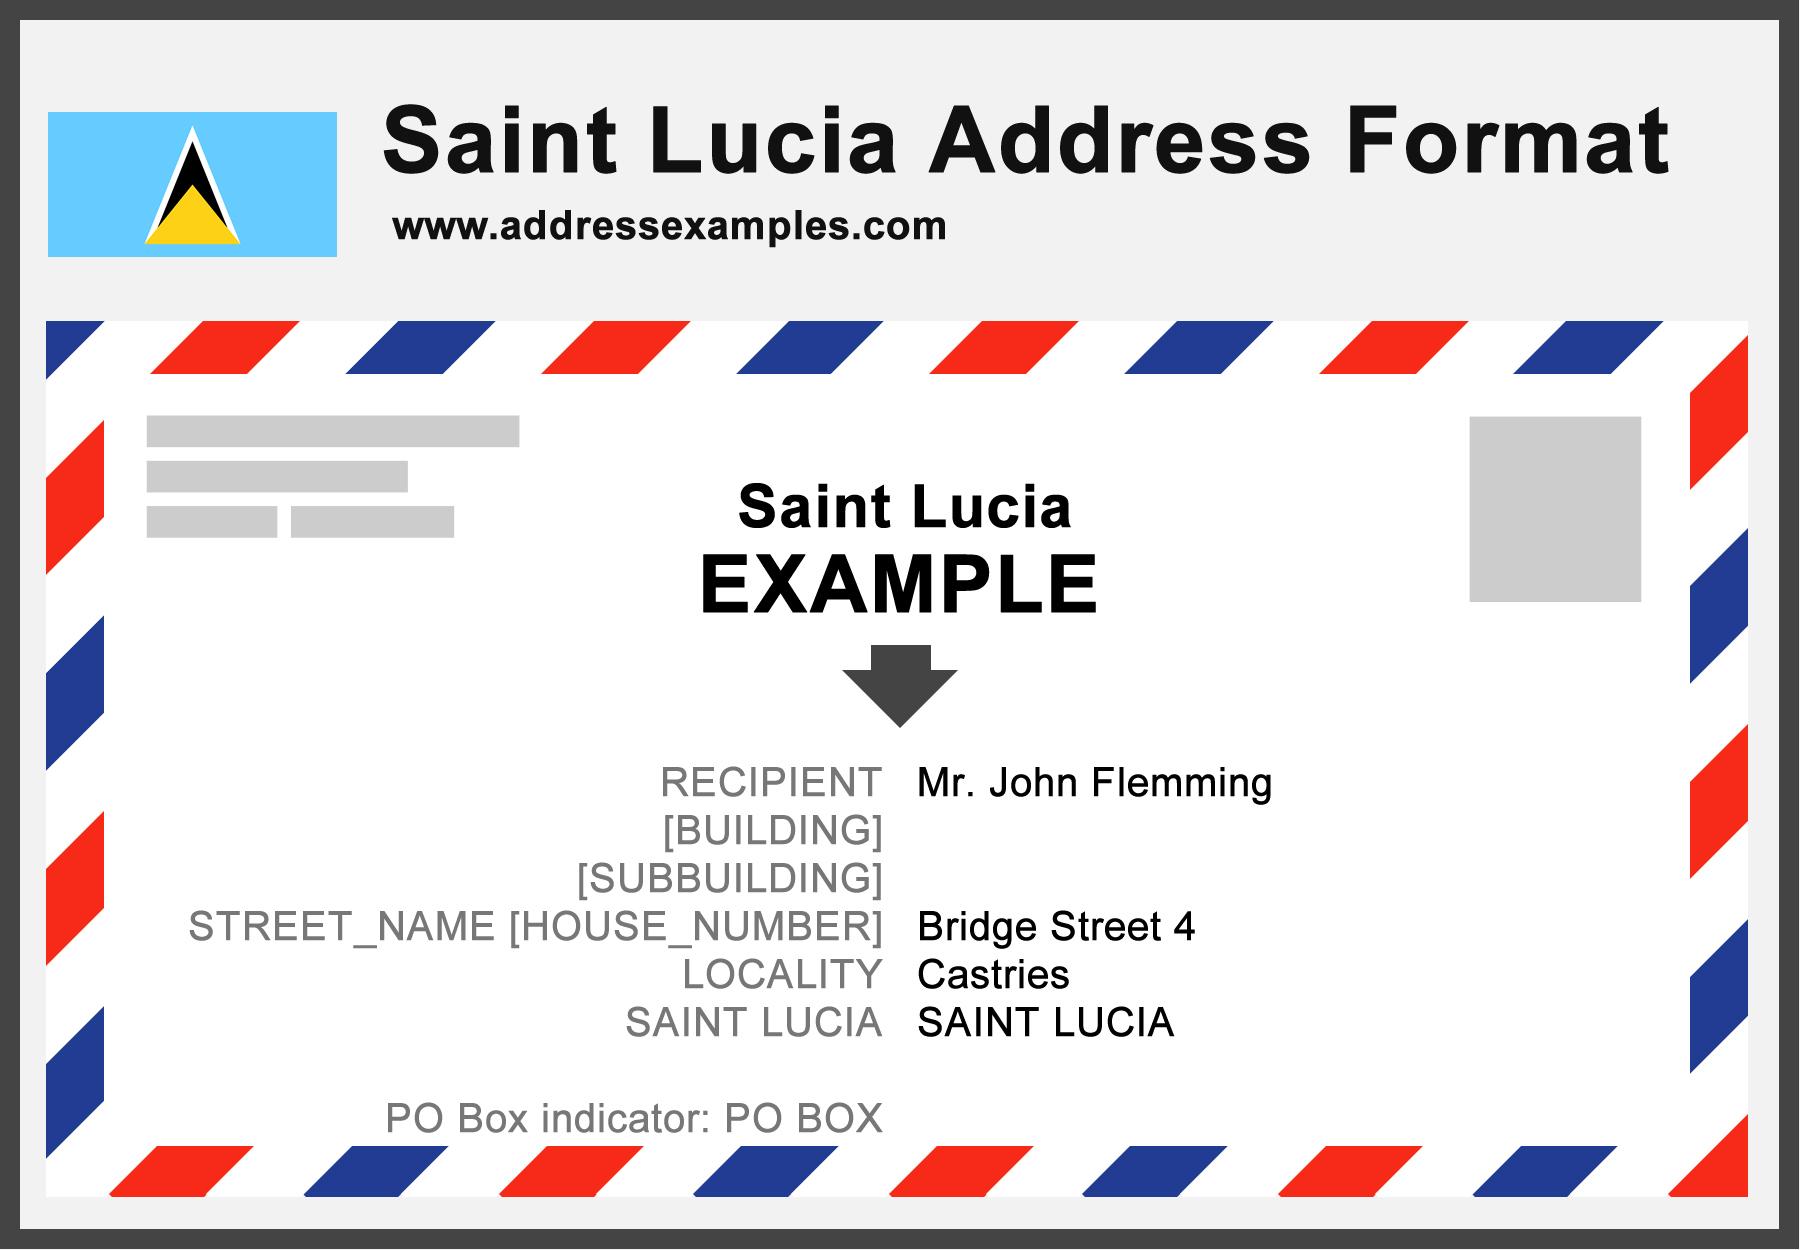 Saint Lucia Address Format